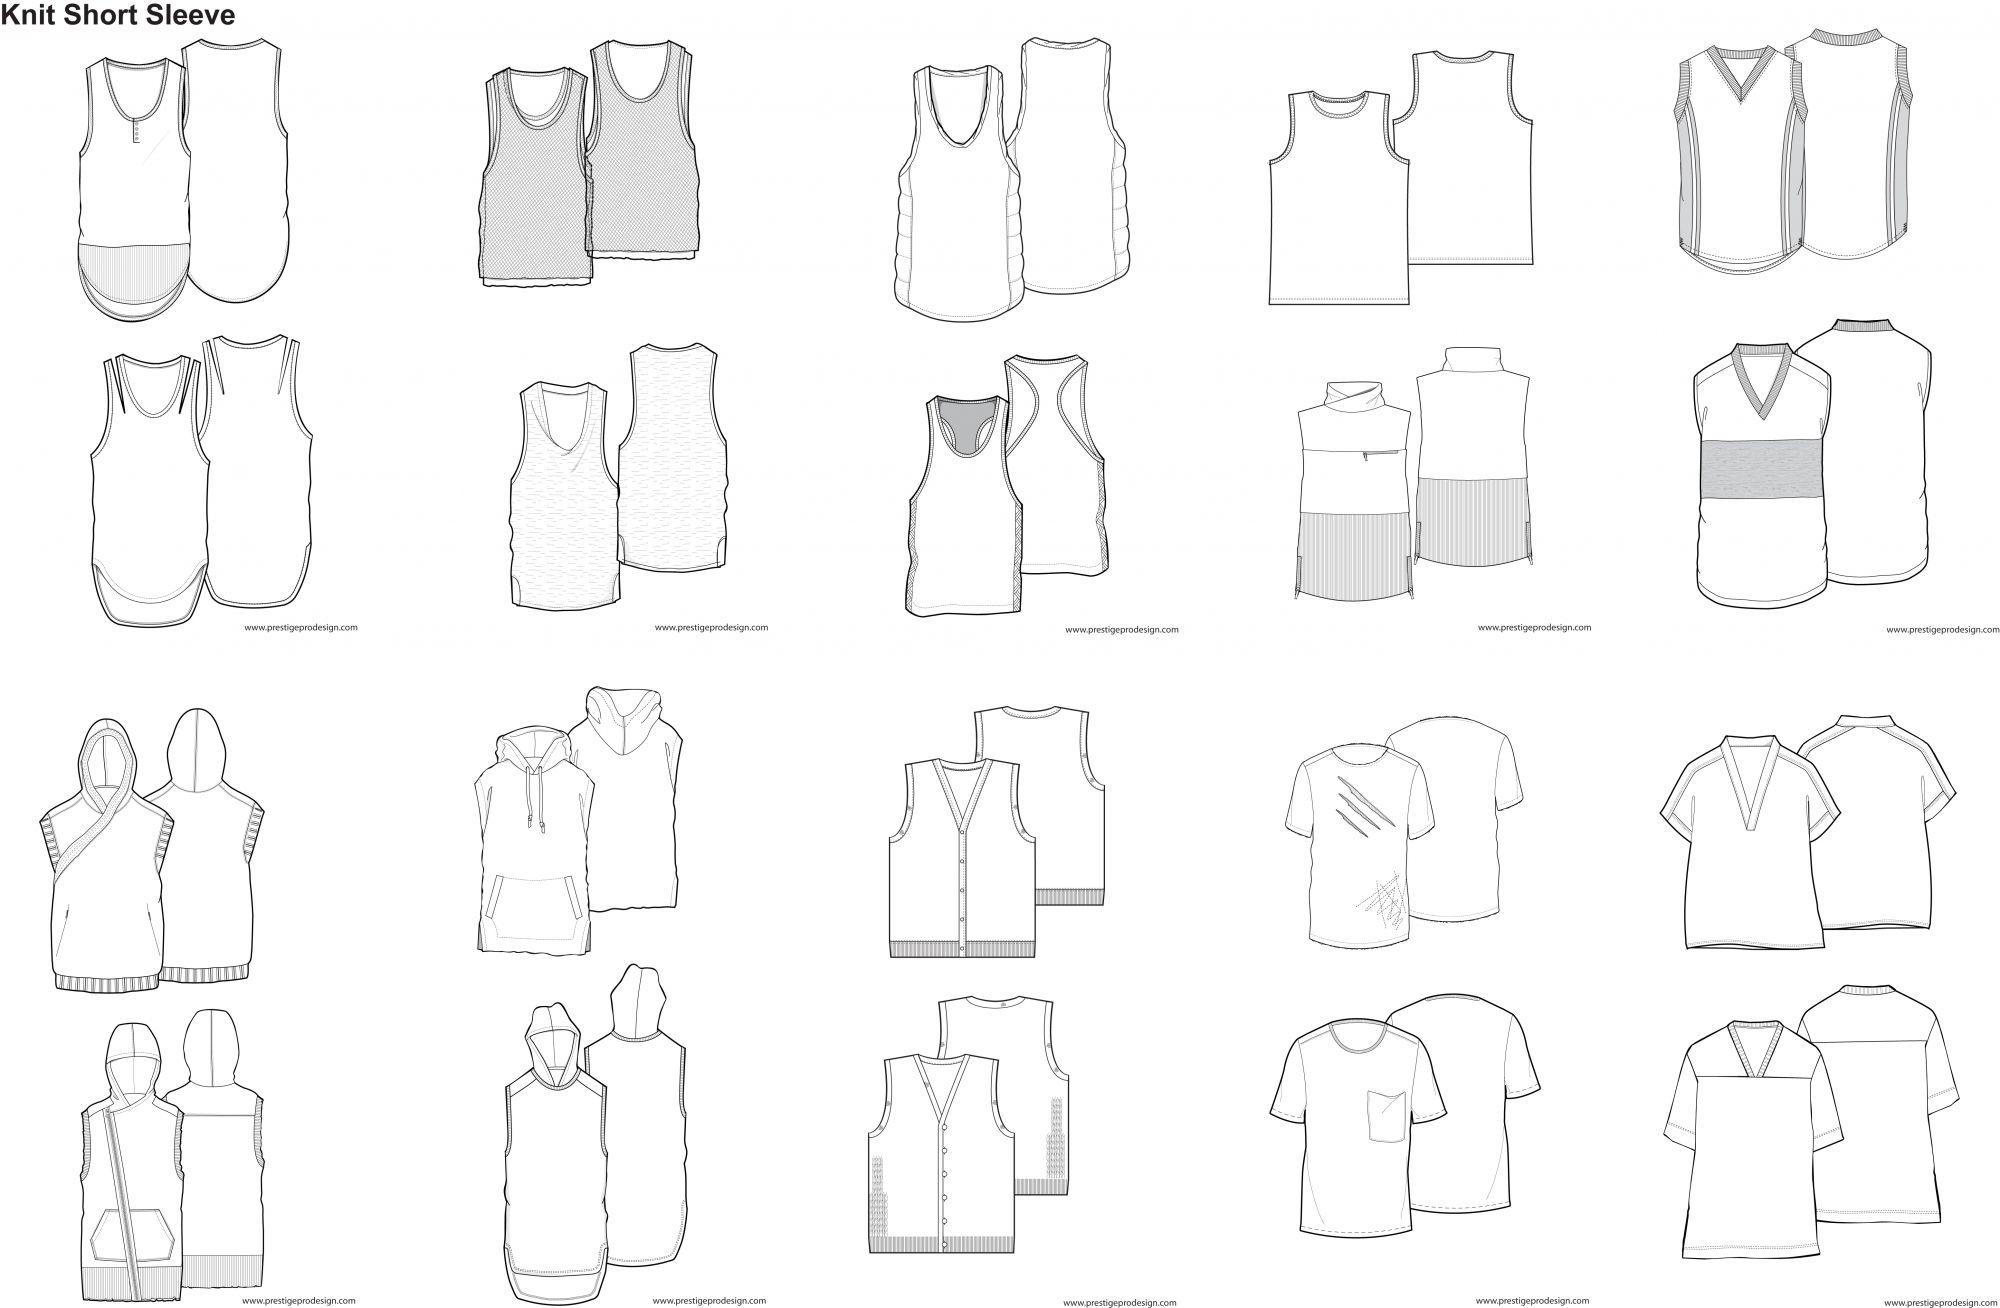 Illustrator Fashion Design Template   Fashiondesign   Pinterest ...